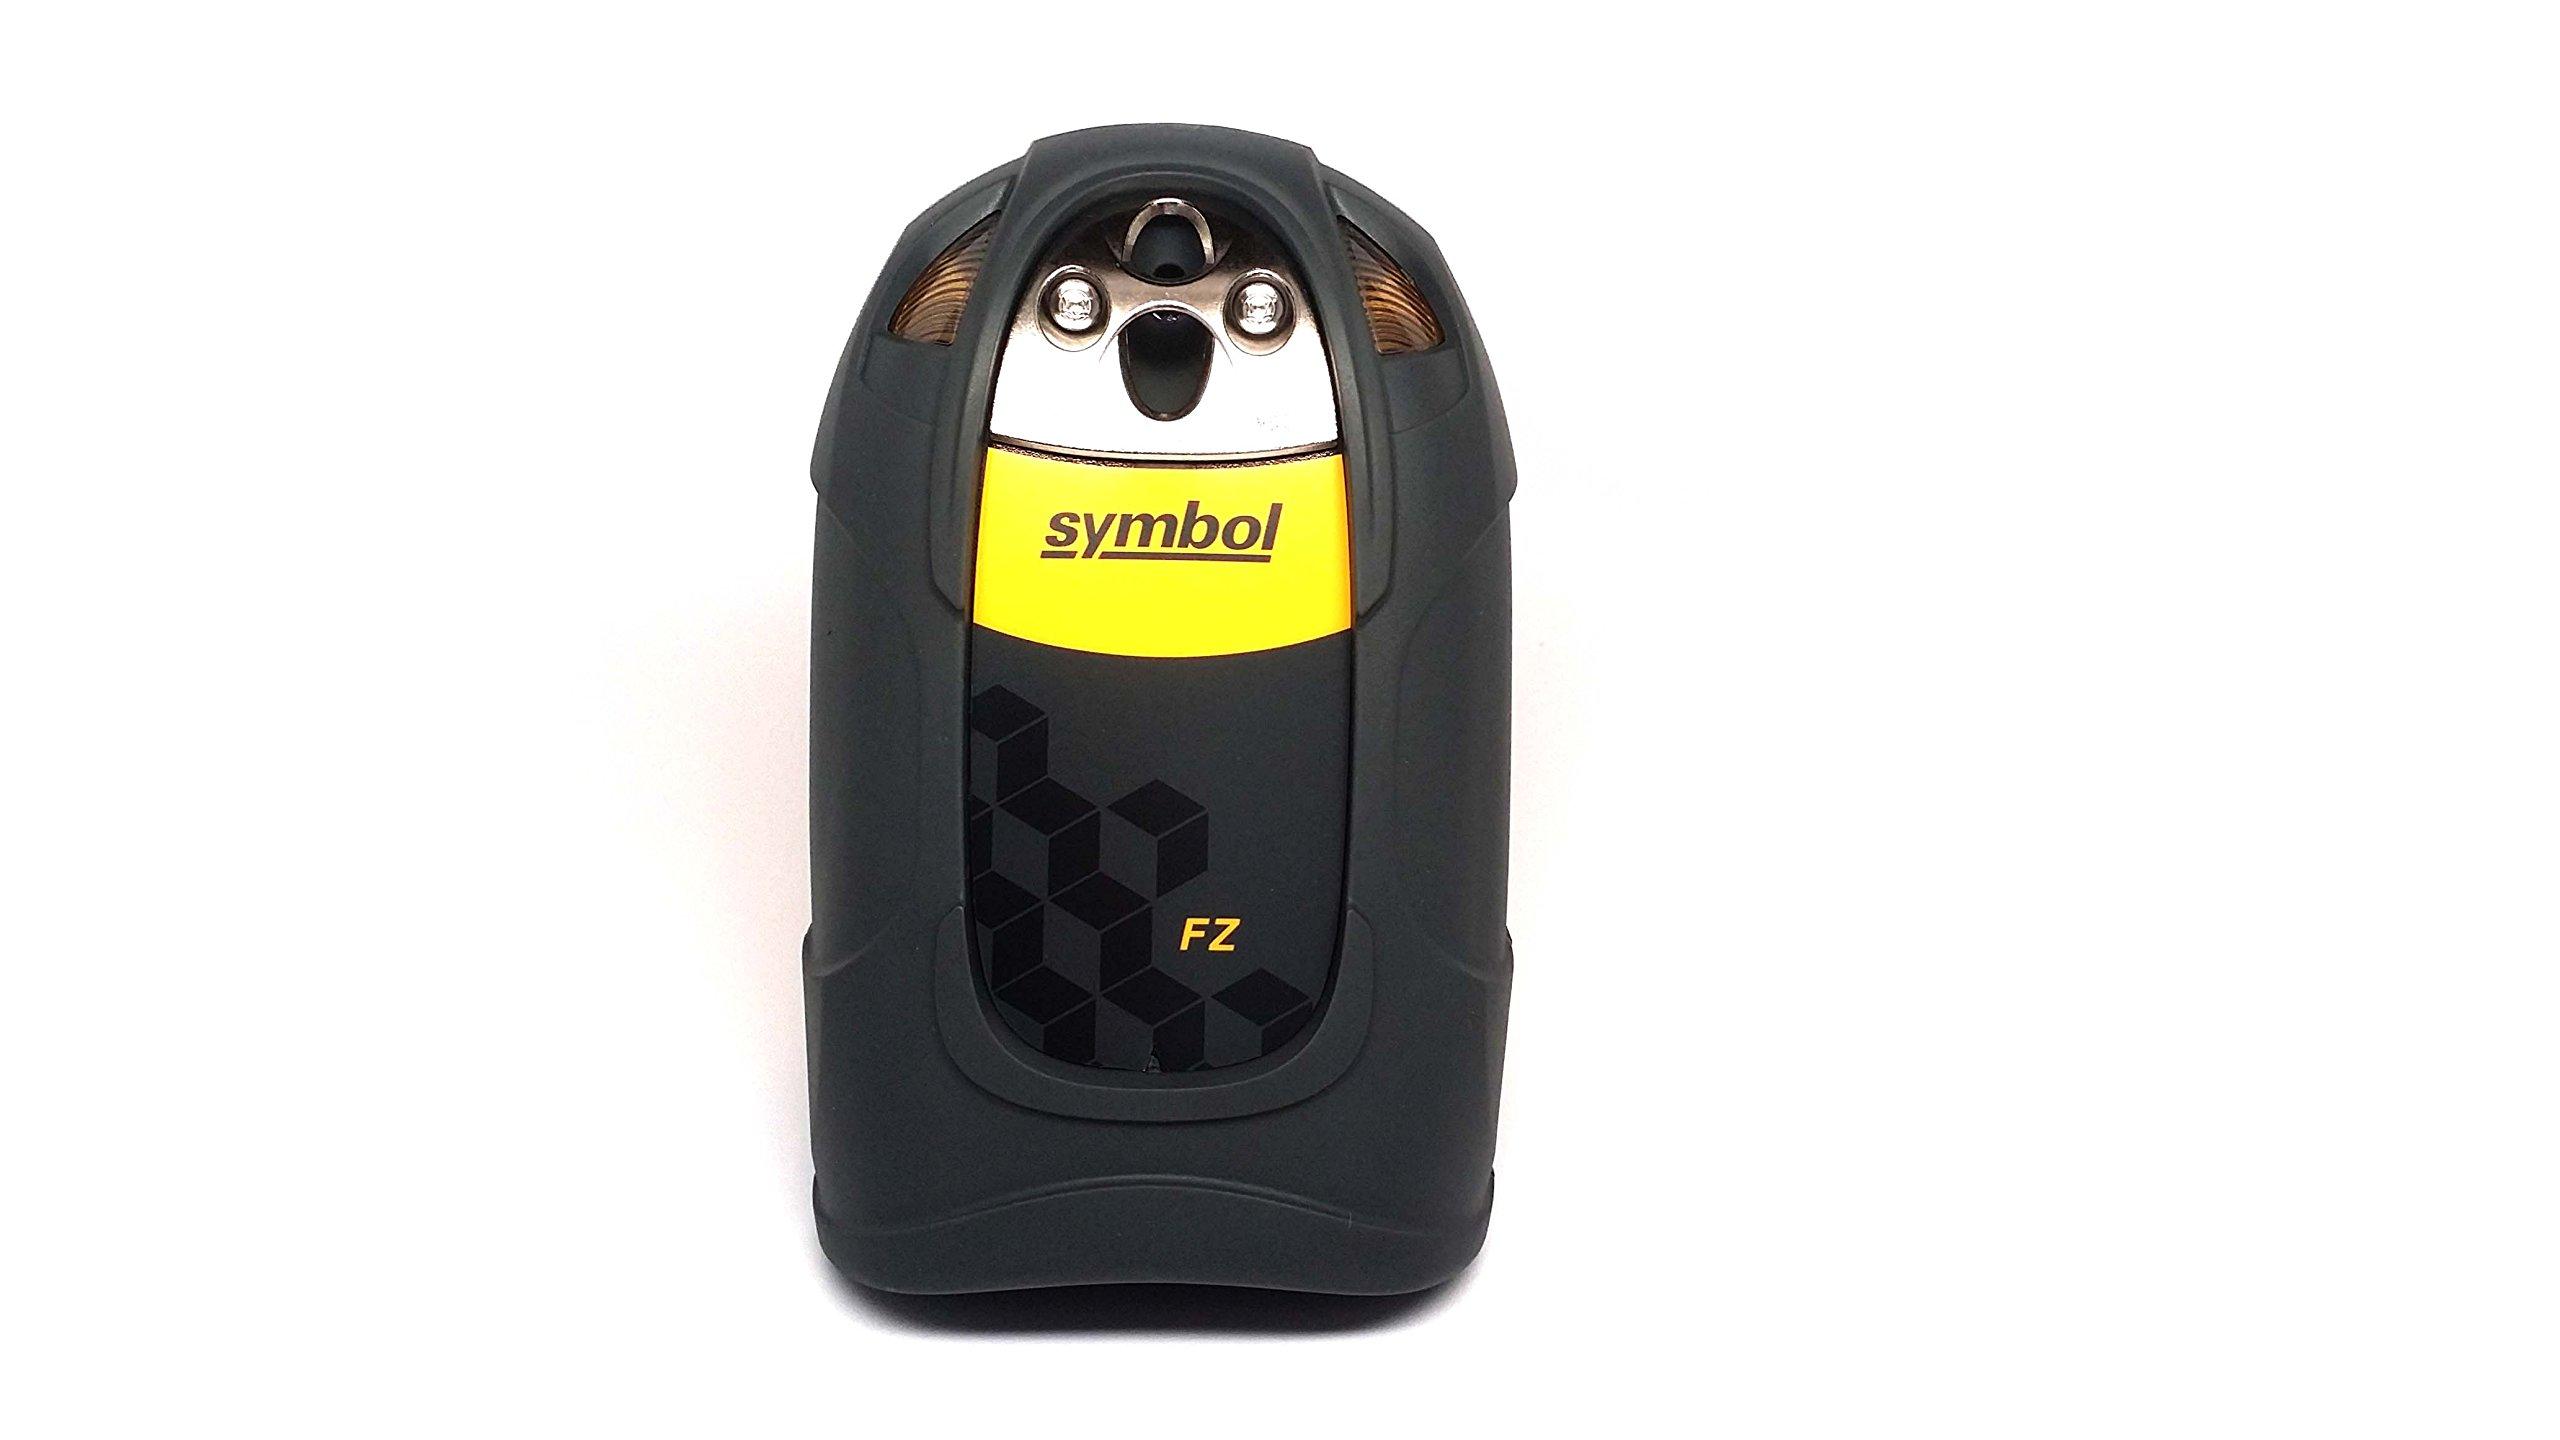 Zebra/Motorola Symbol LS3578-FZBU0100UR, Rugged, cordless scanner with integrated Bluetooth, Includes Cradle and USB Cord by Zebra/Motorola Symbol (Image #4)